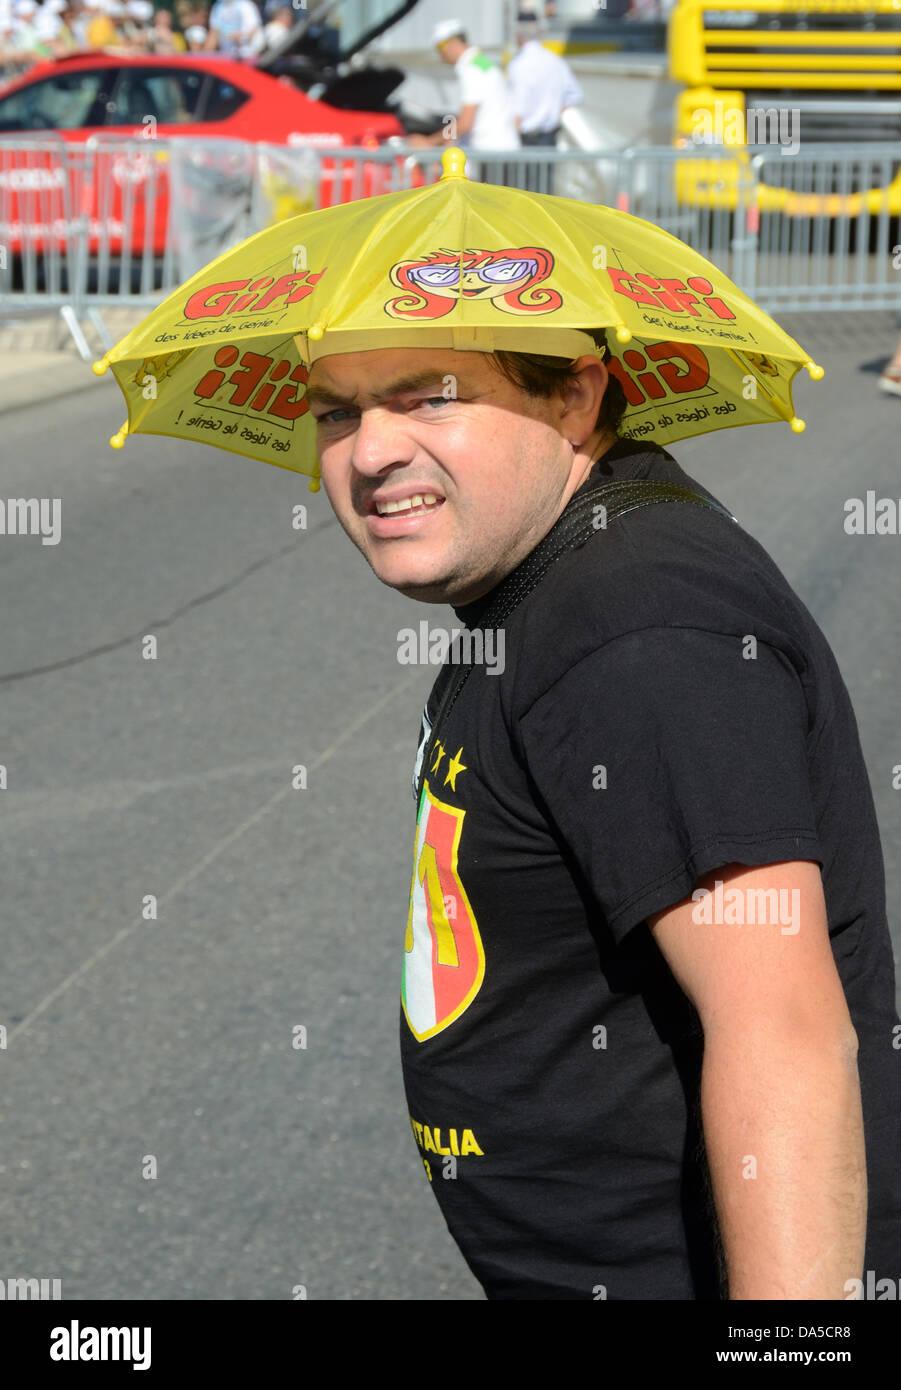 d3c8198cc92ae Man Wearing Funny Umbrella Hat. Provence